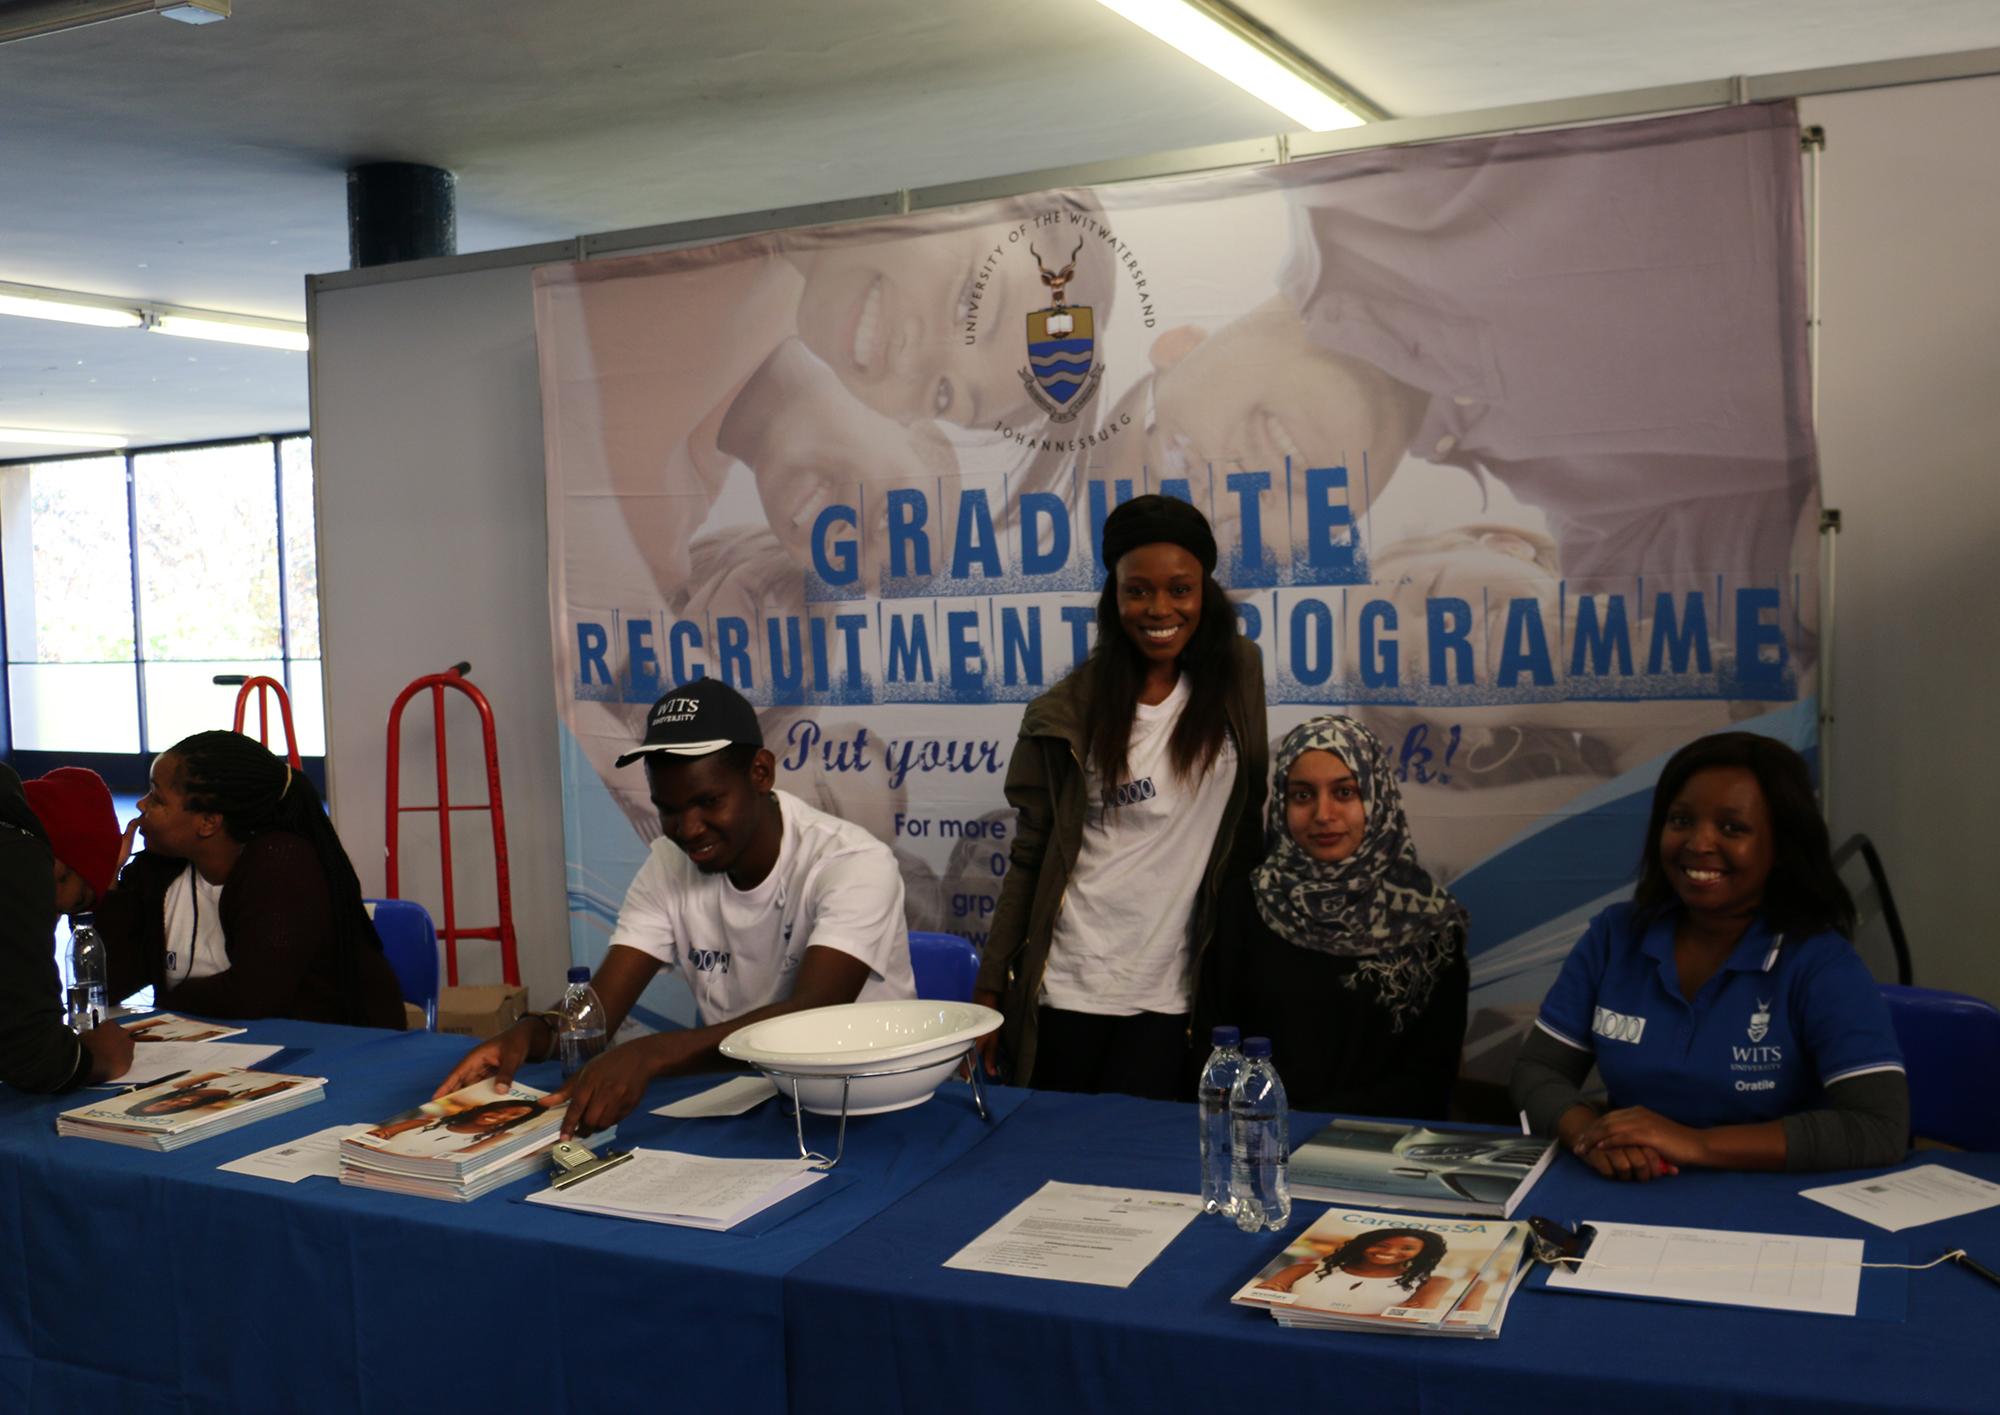 Careers fair offers overseas job prospects